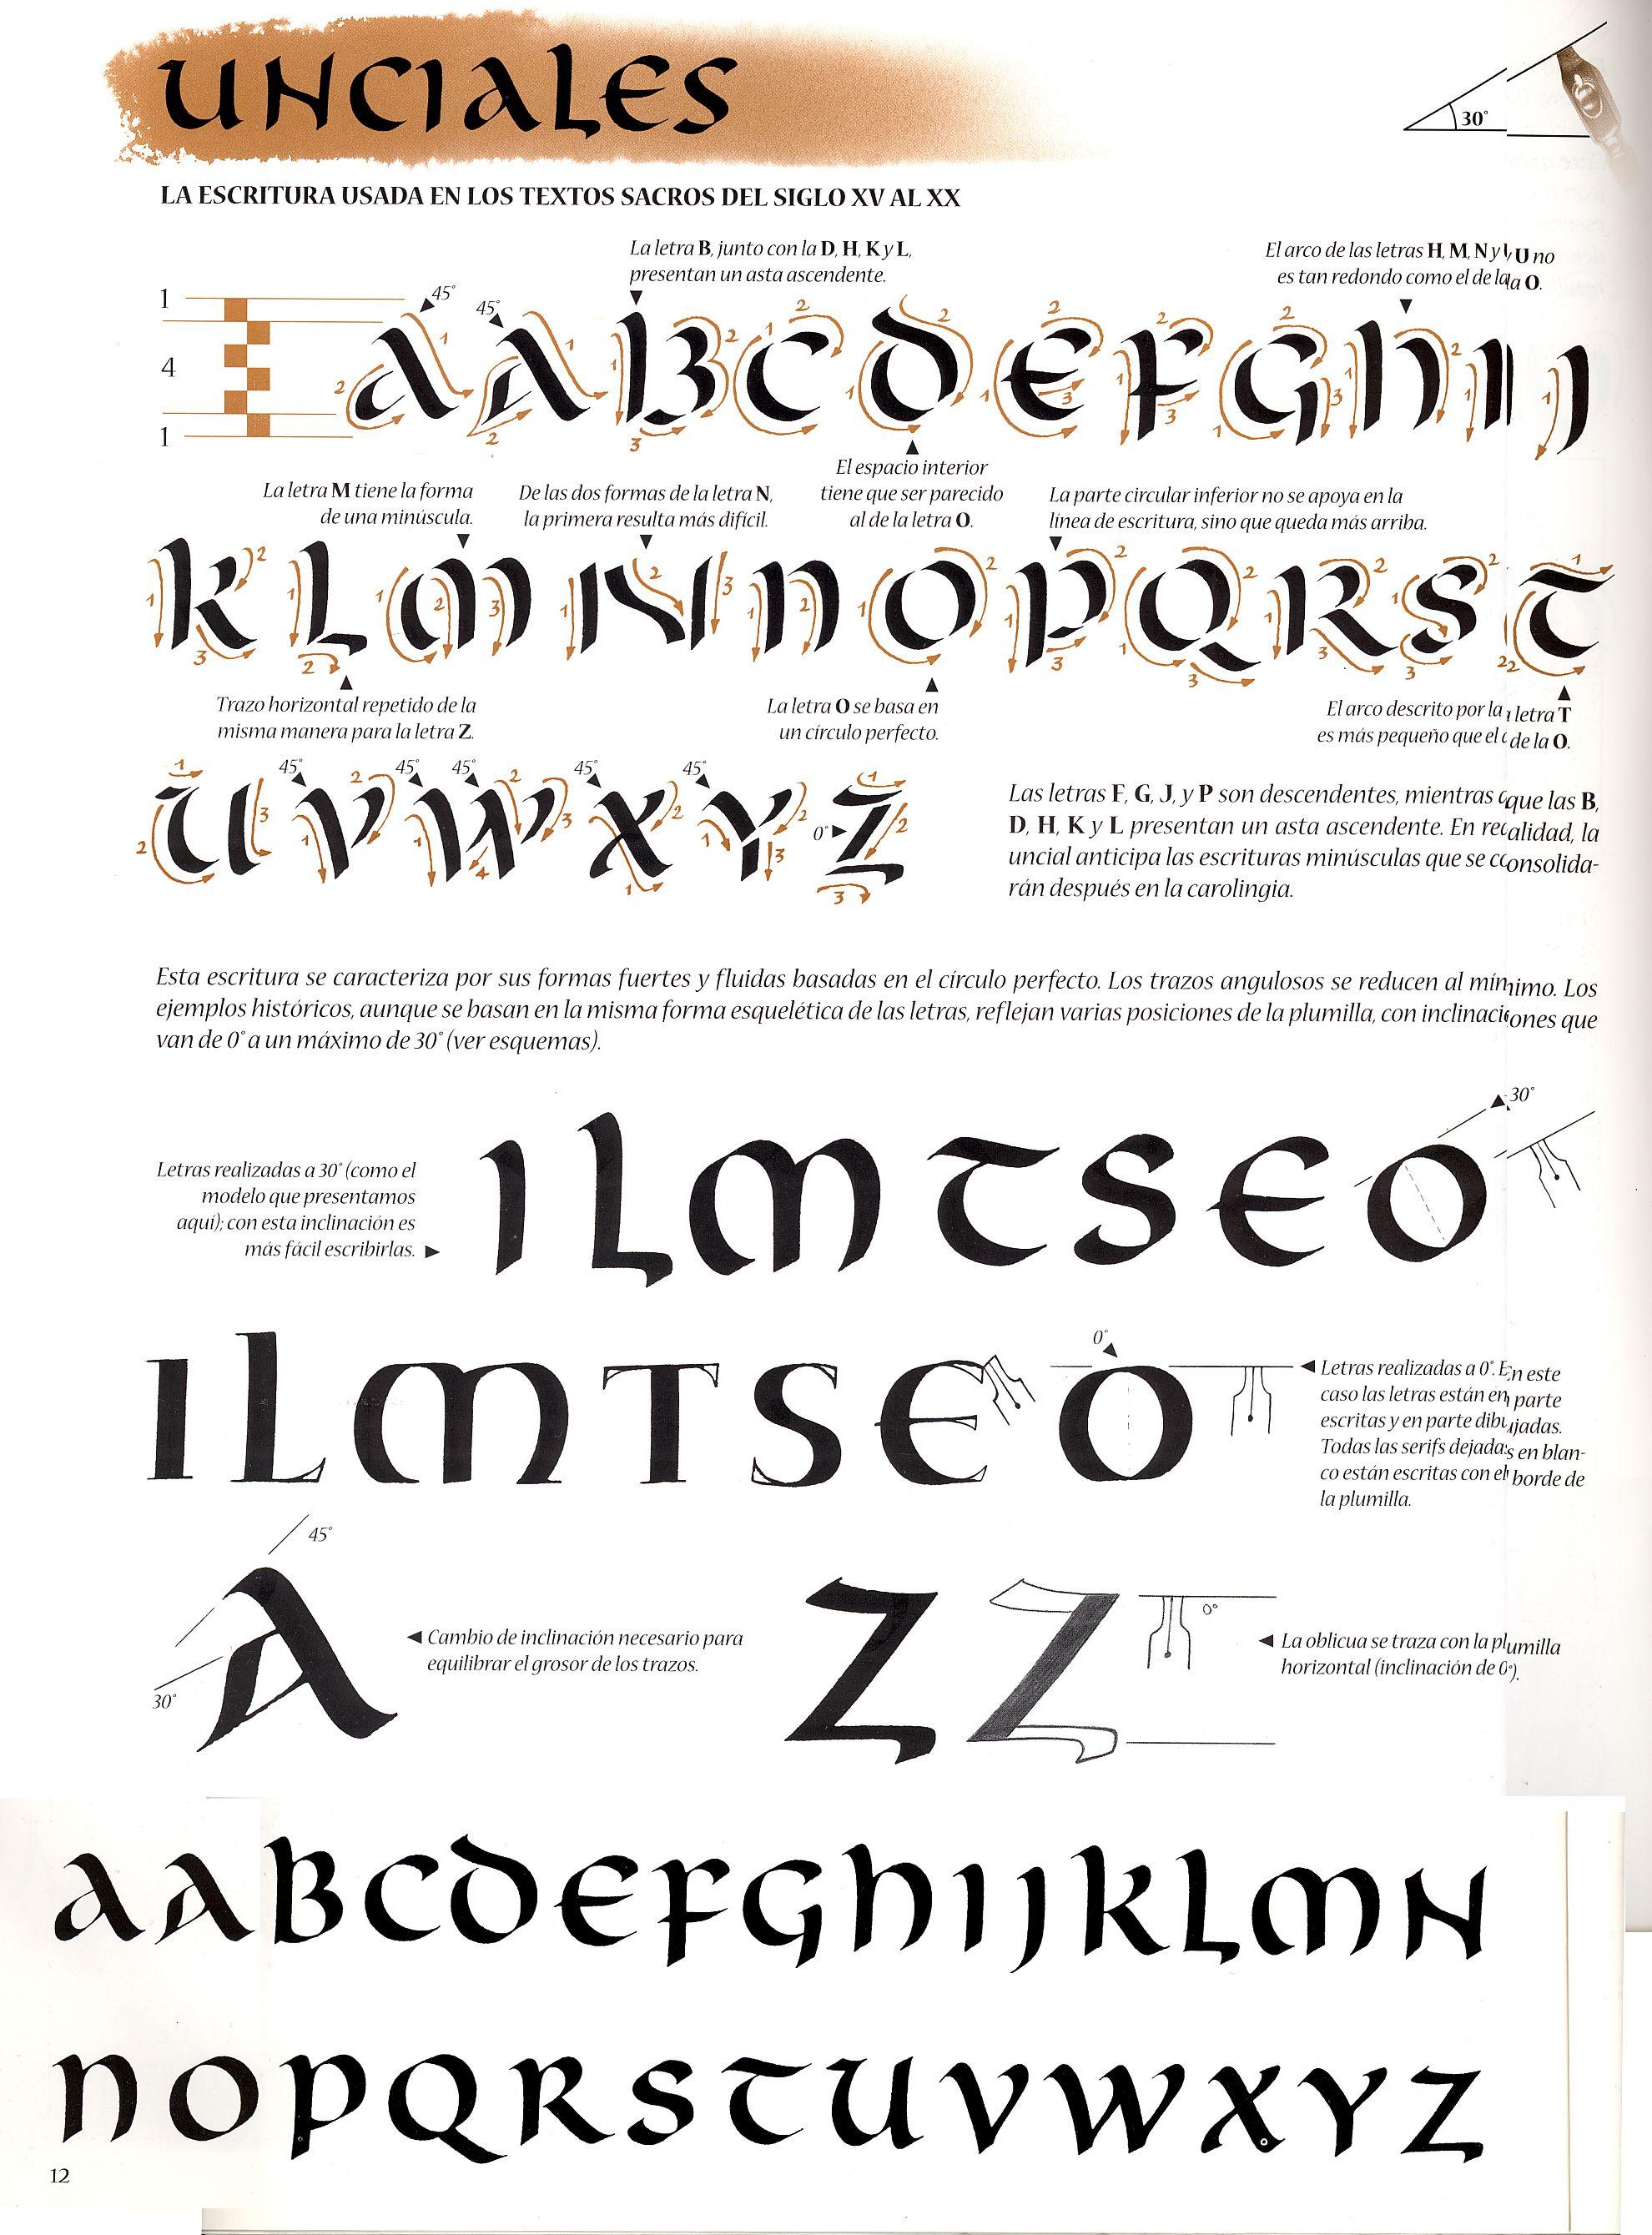 hojas para practicar caligrafia con plumilla - Buscar con Google